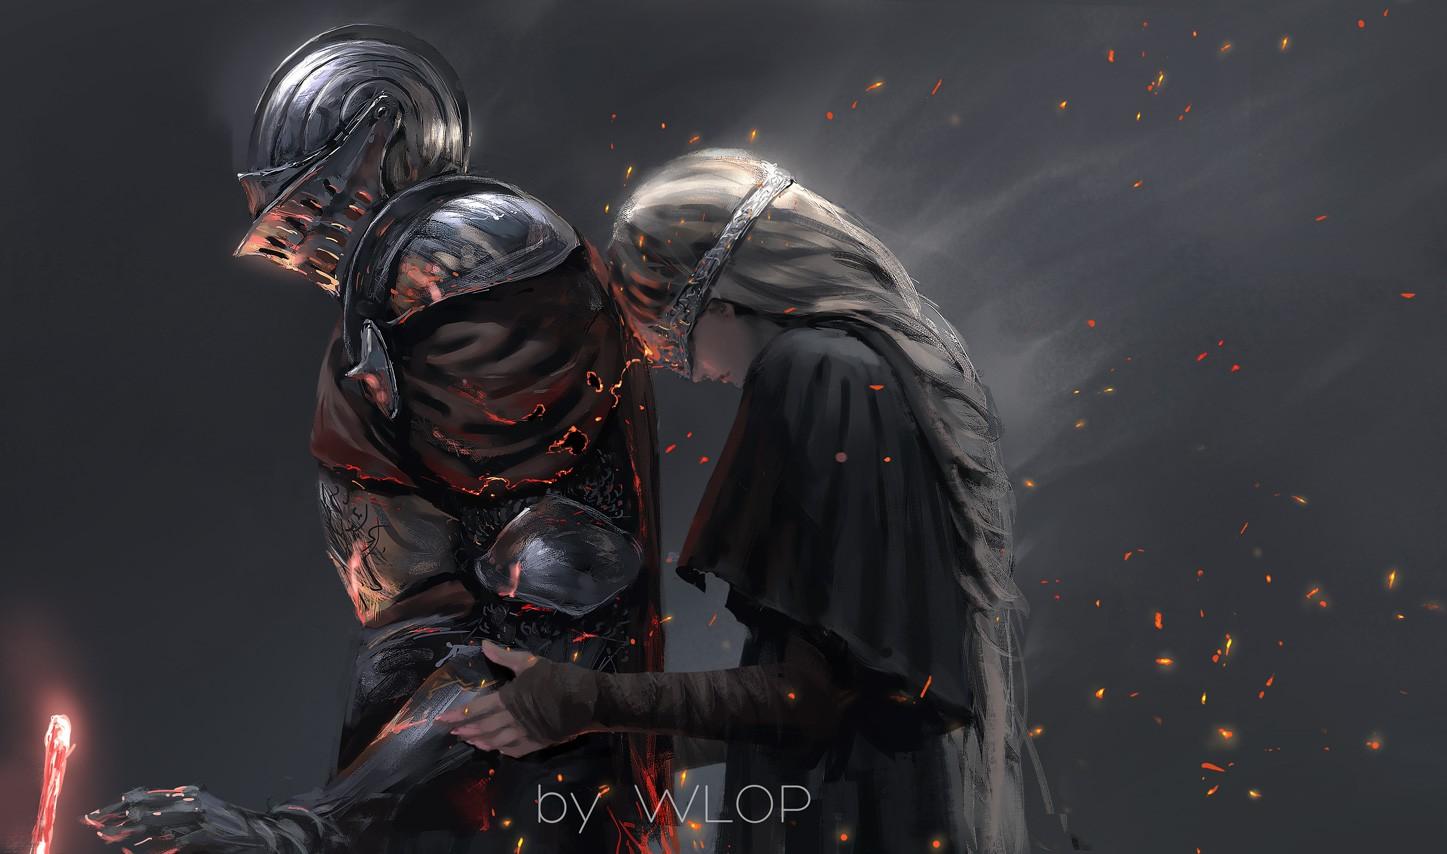 1447x854_px_Dark_Souls_III_digital_art_fantasy_Art_knight_Princess-835657.jpg!d